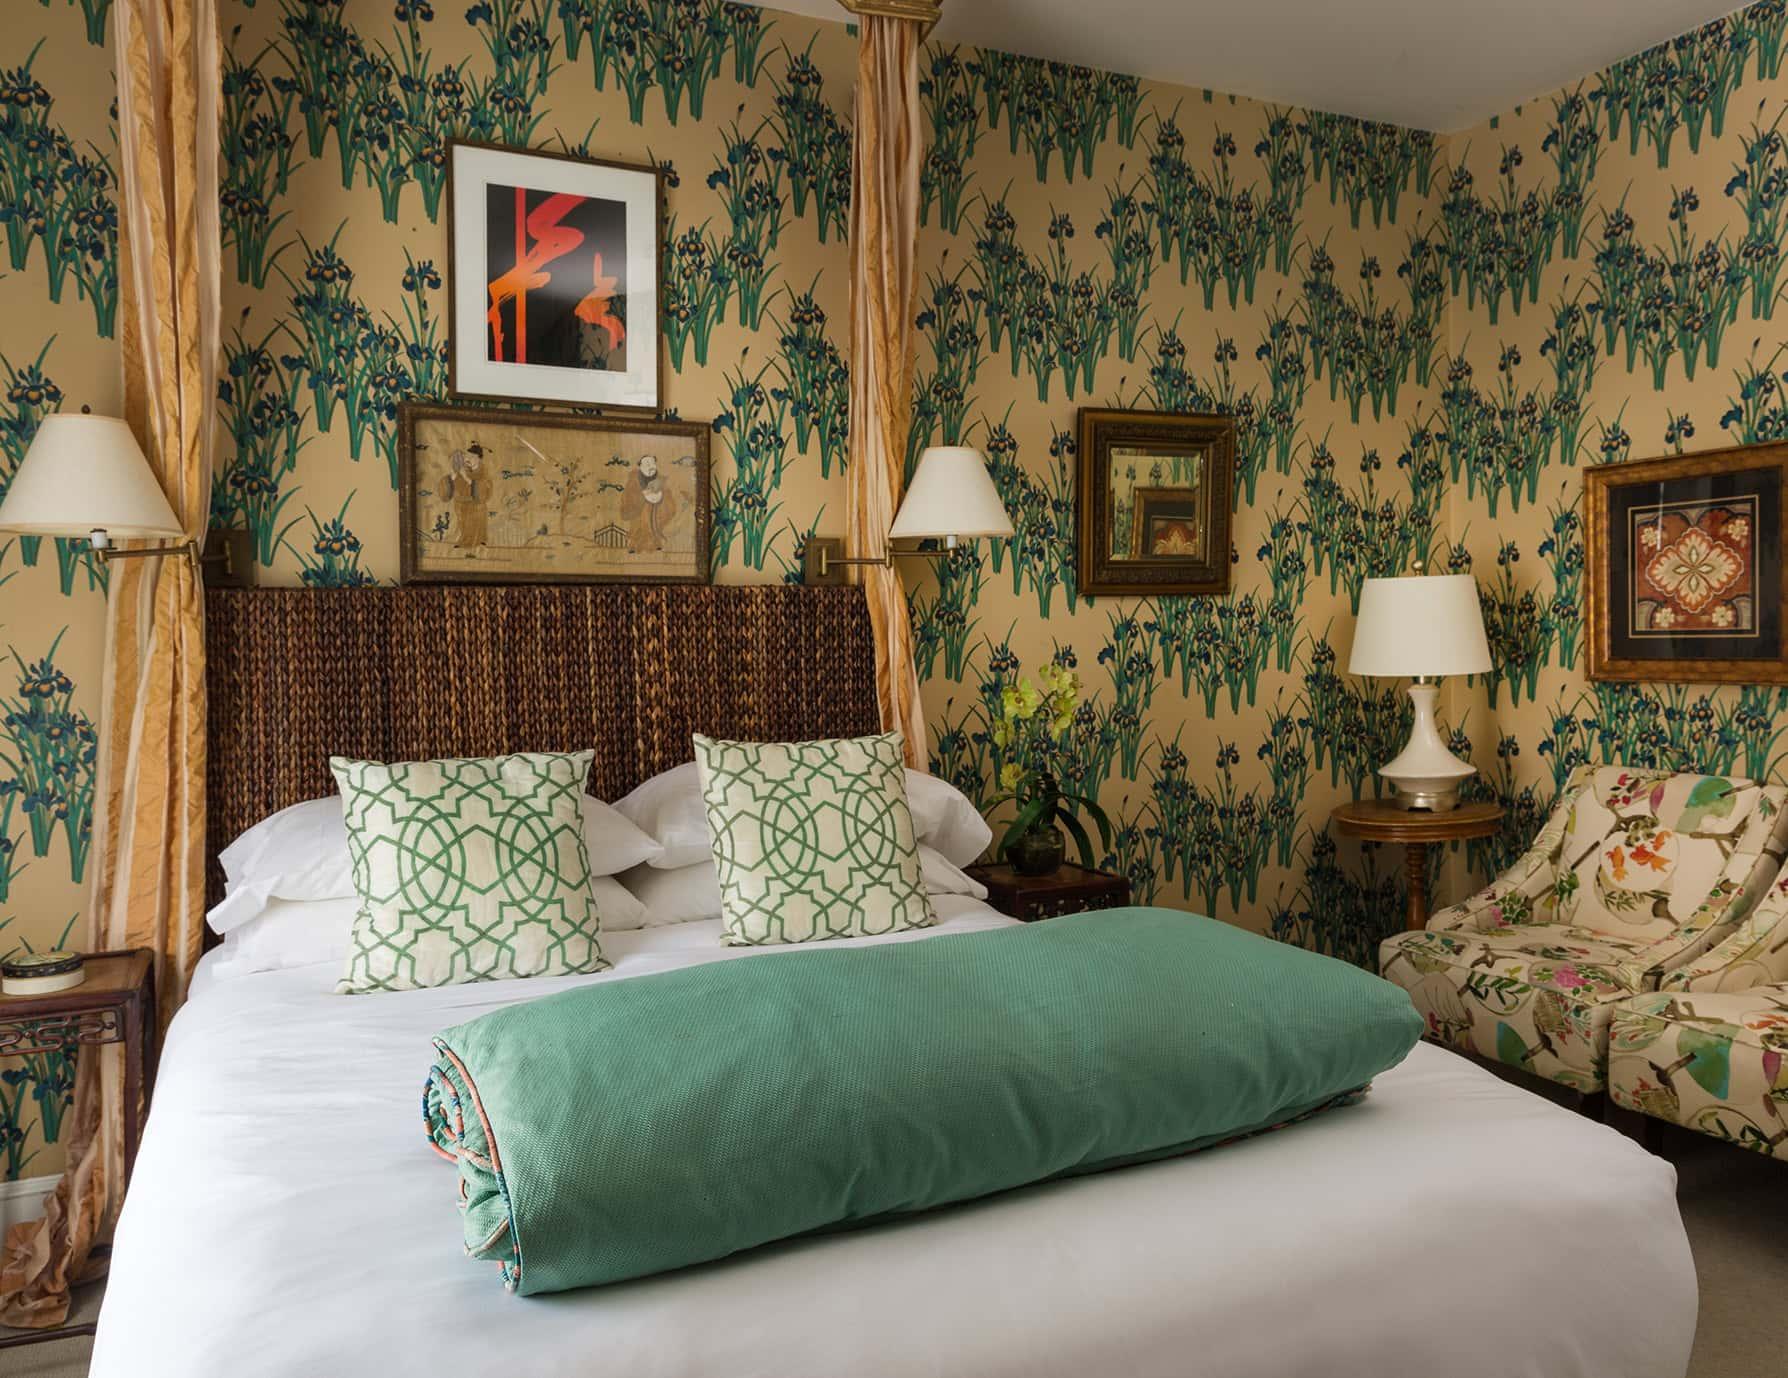 Iris Room bed - Portland Maine lodging